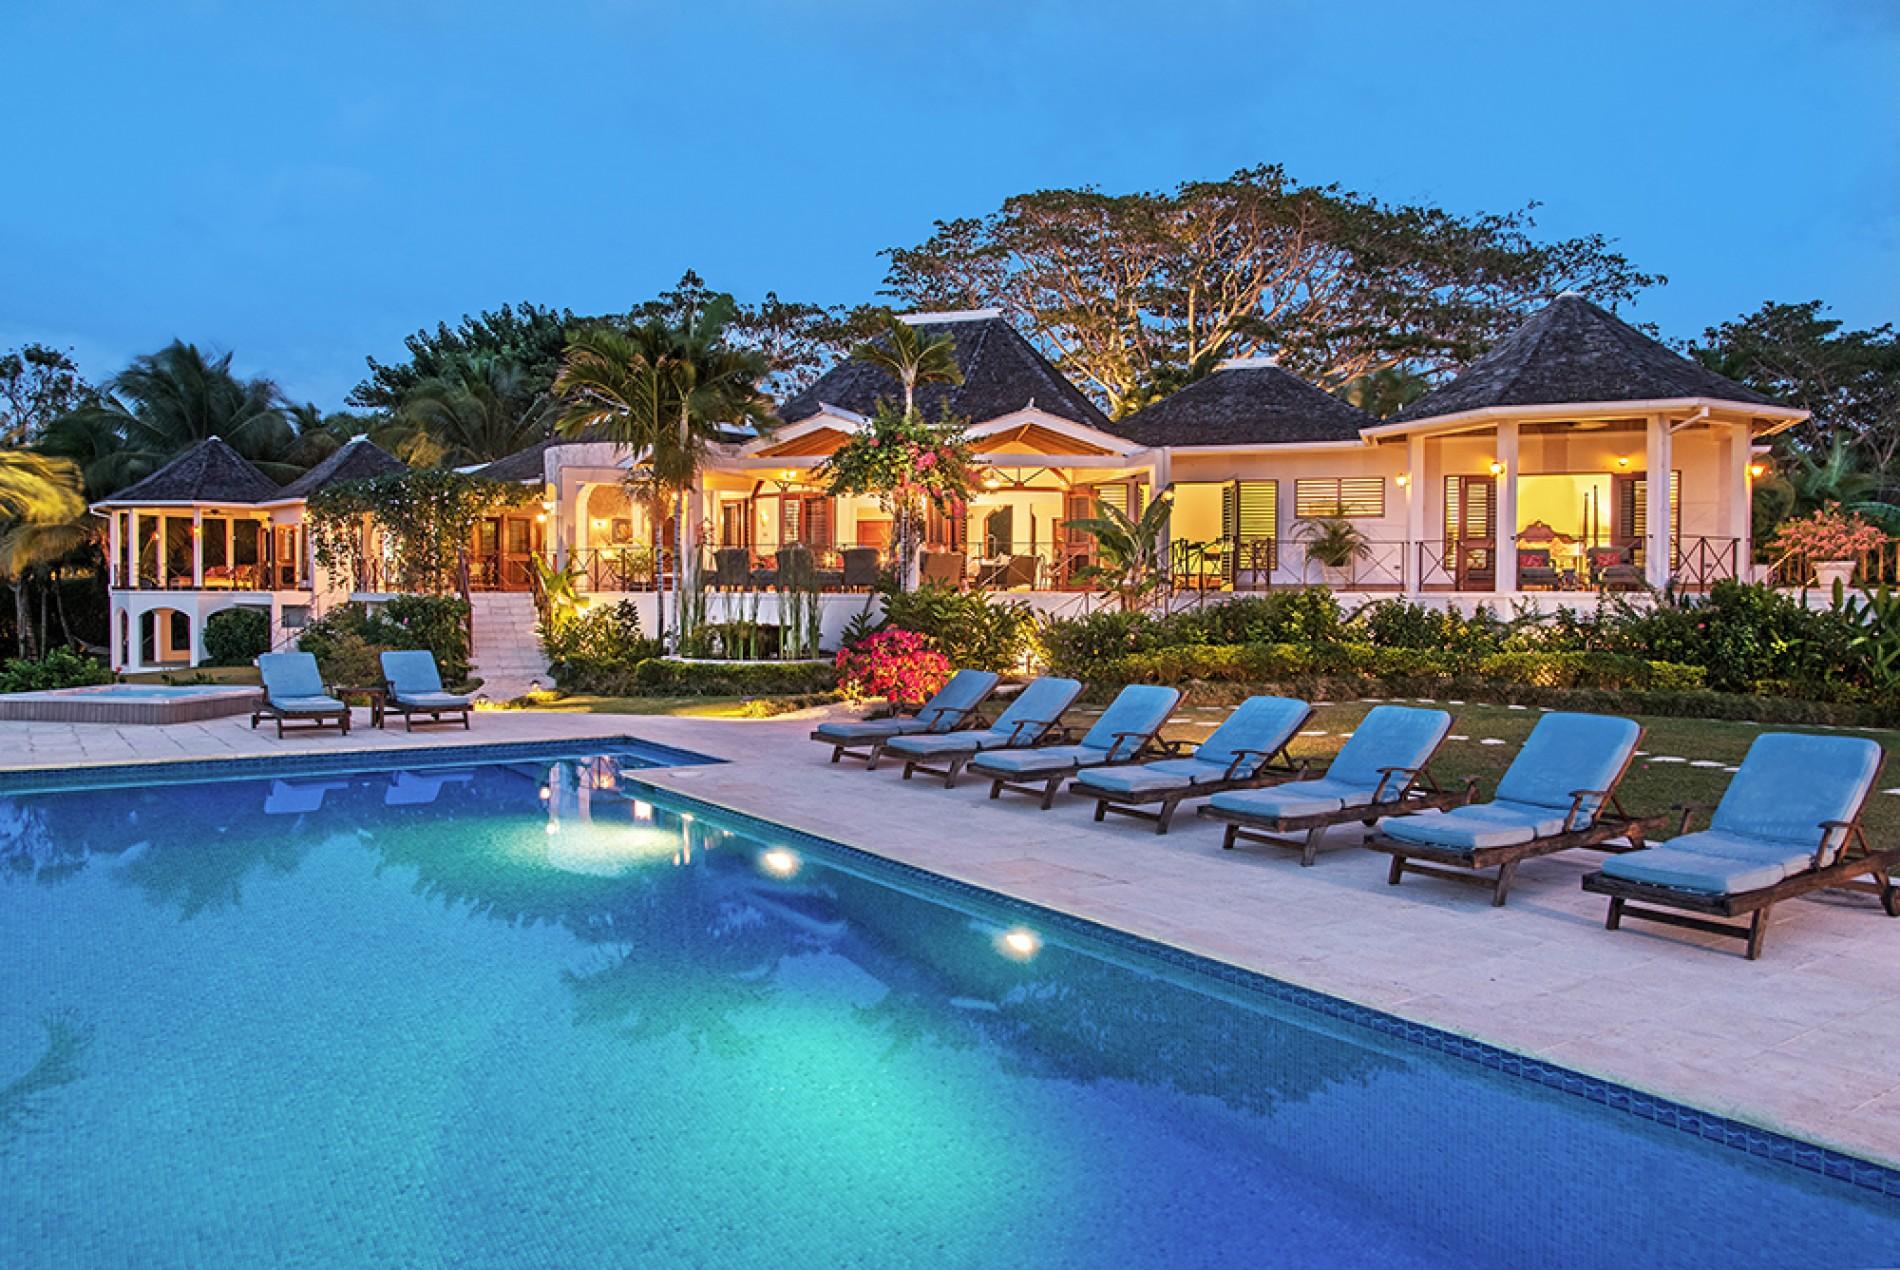 Sugar Hill At The Tryall Club Villa In Jamaica Luxury Villa